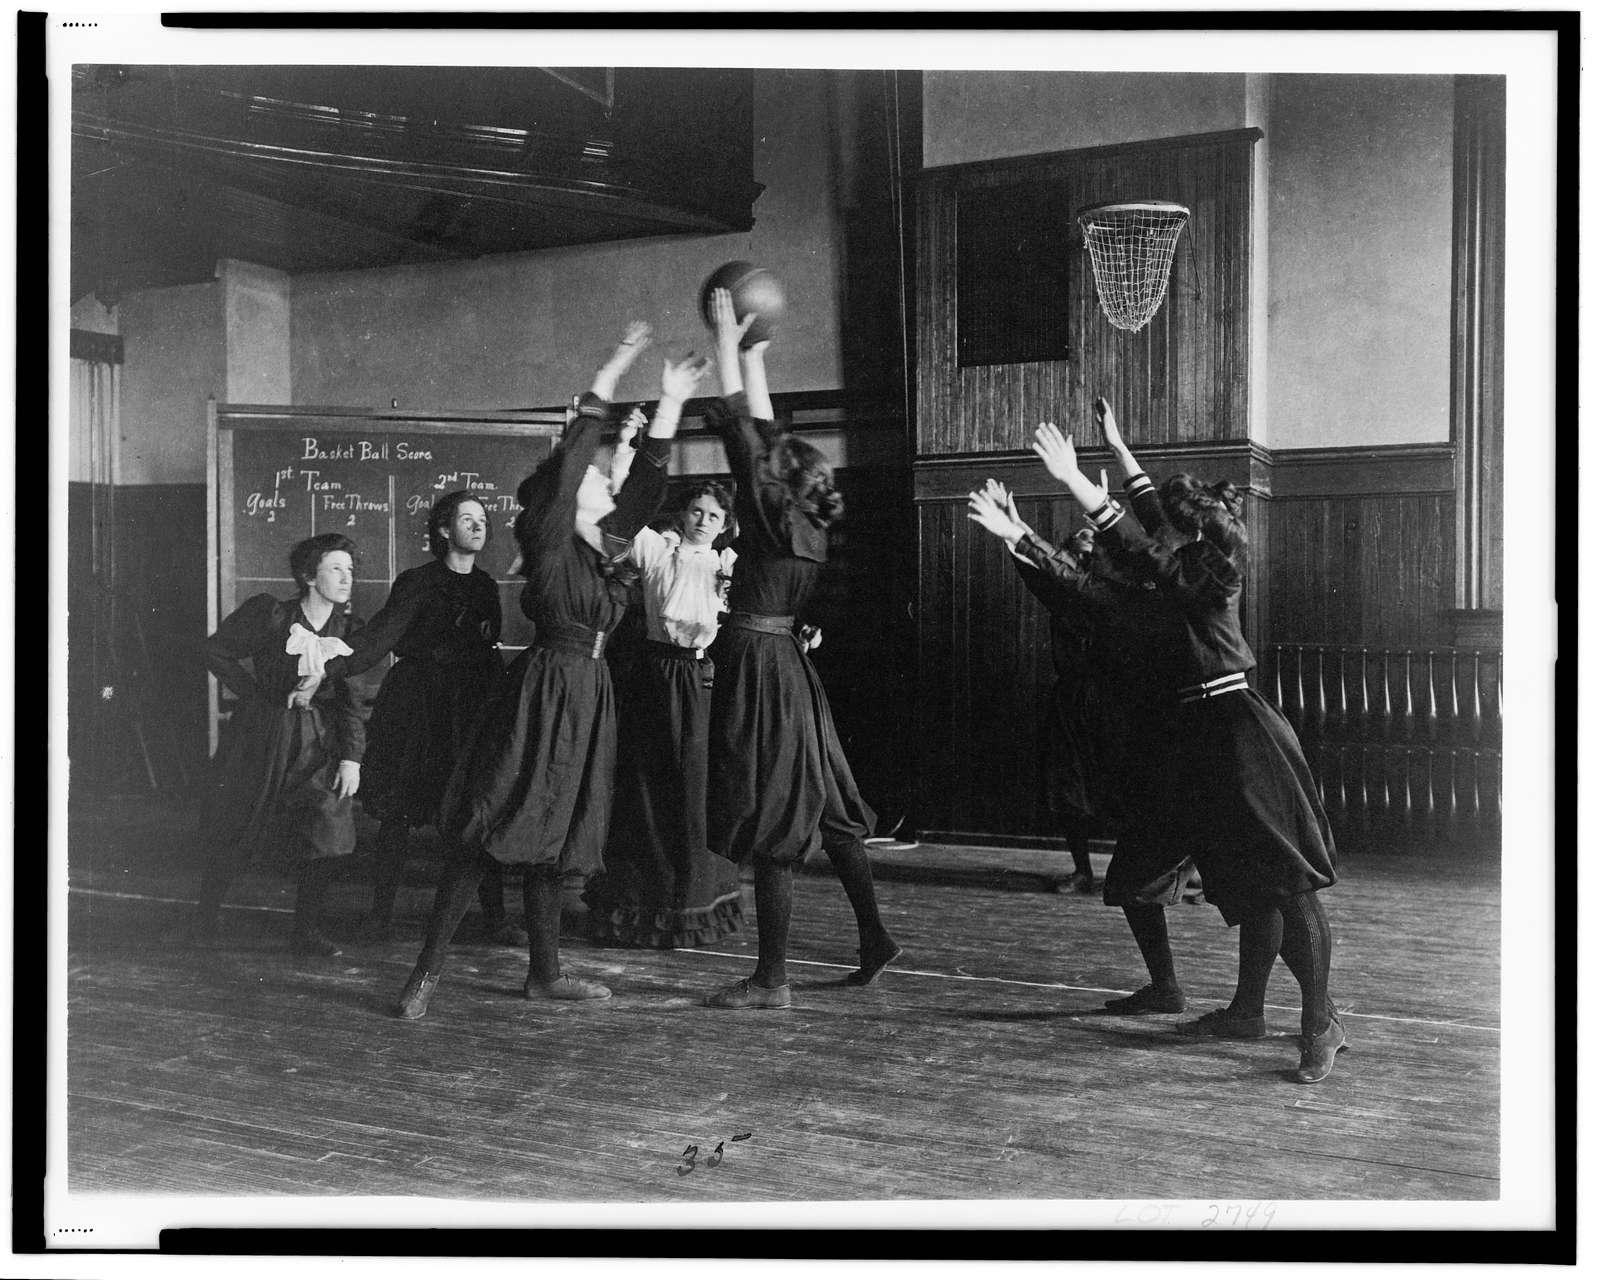 [Female students playing basketball in a gymnasium, Western High School, Washington, D.C.]